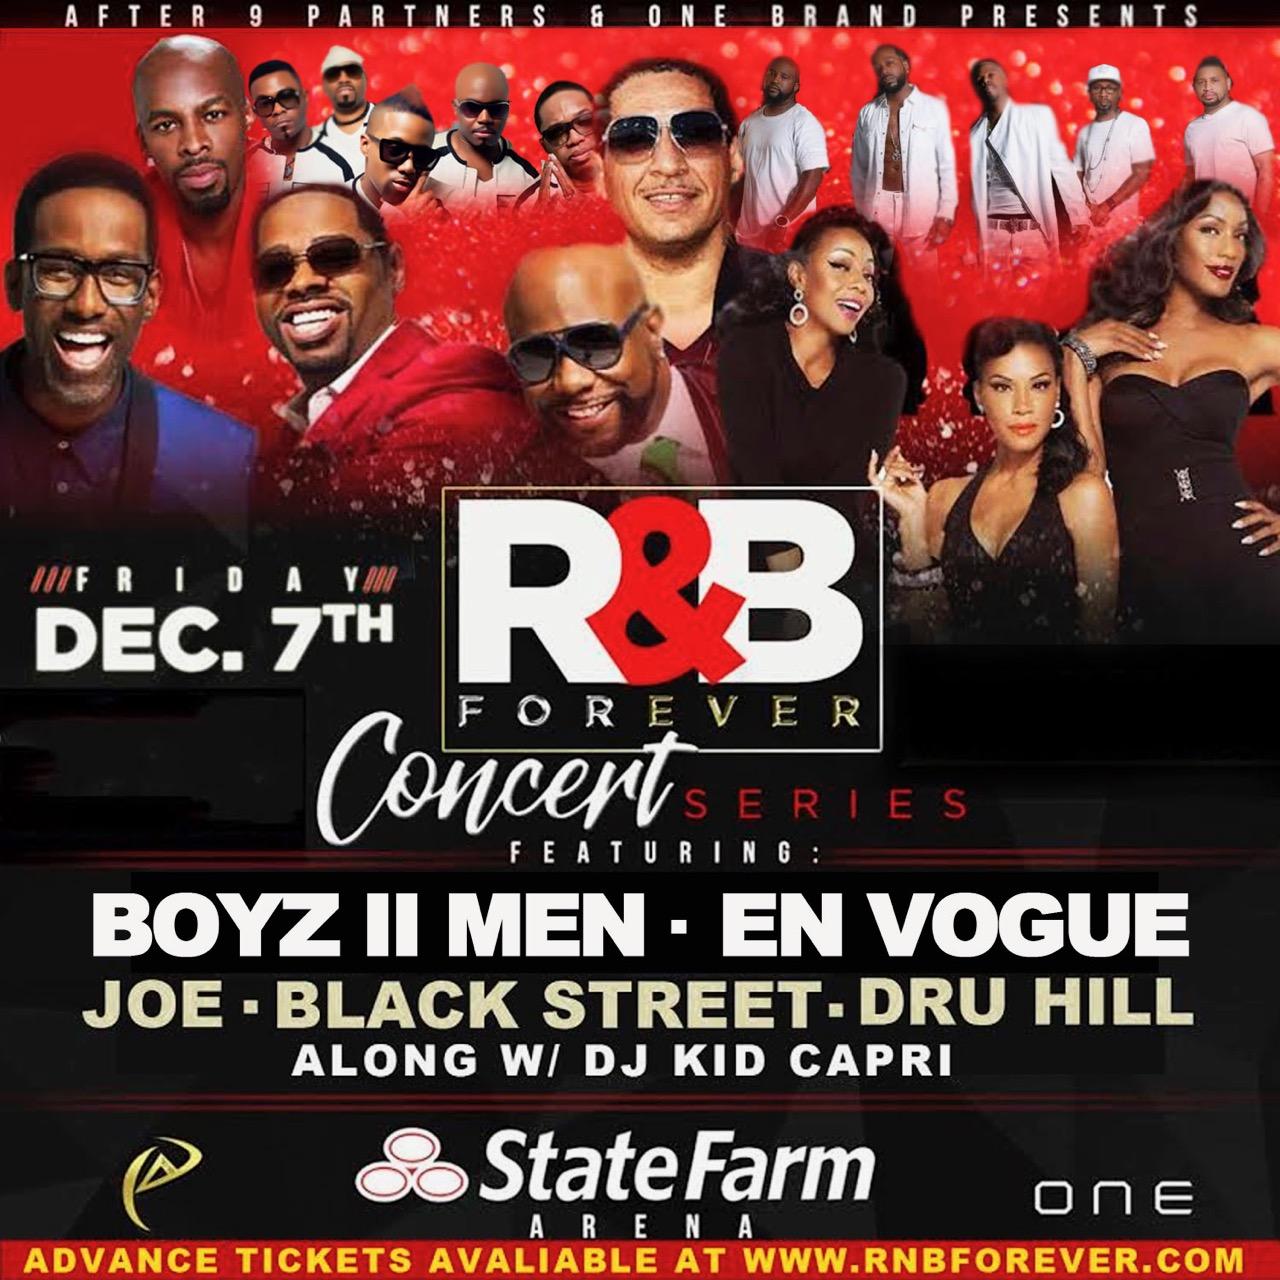 R&B Forever Concert Series